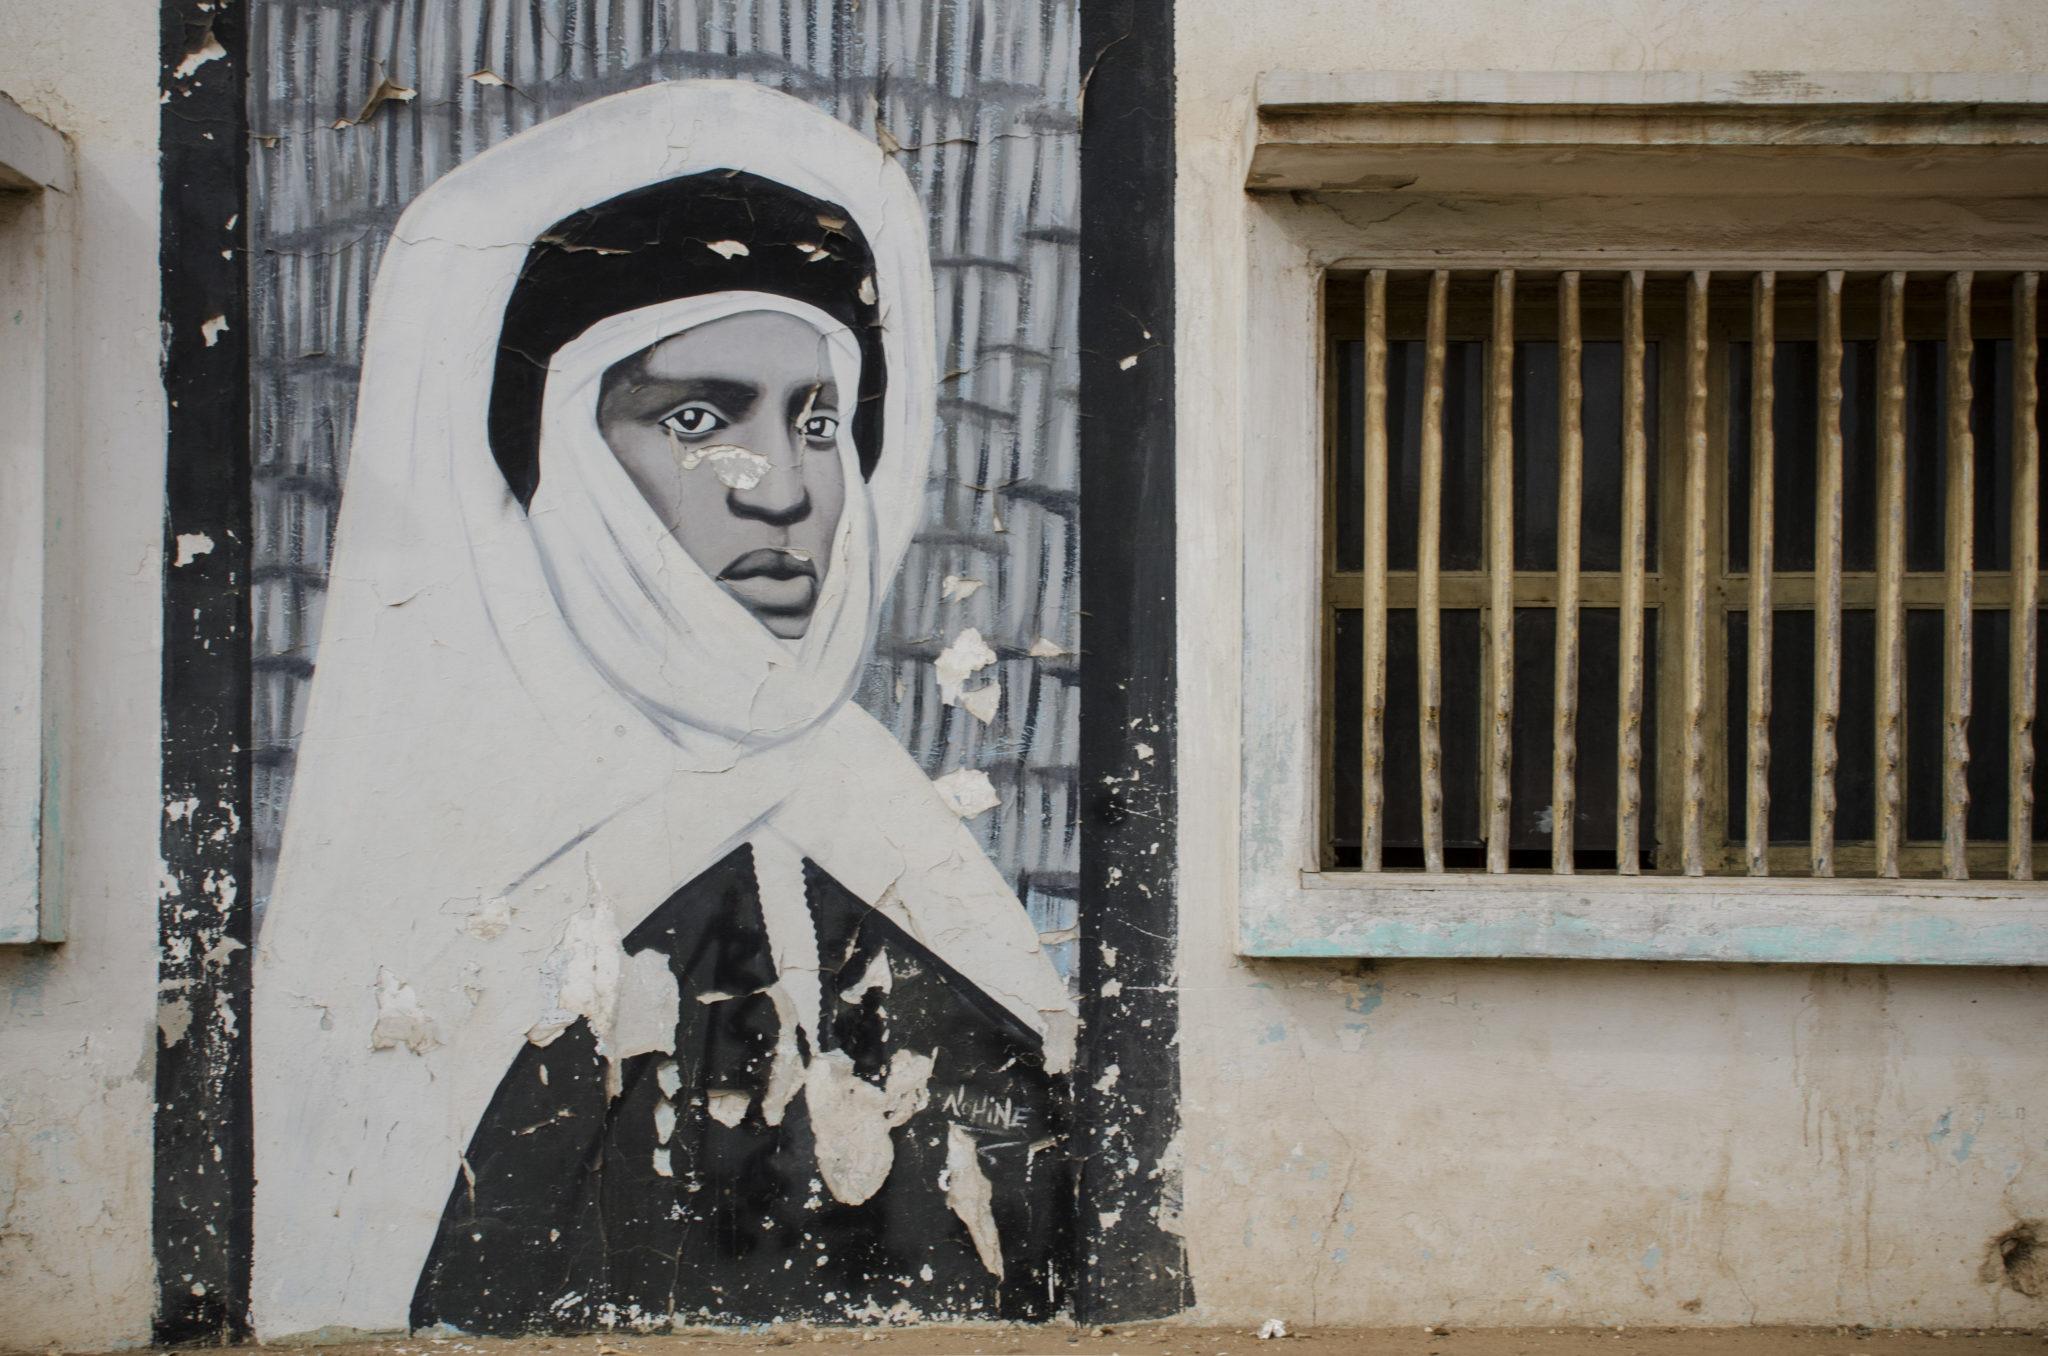 Mbour-Petite-Cote-Senegal-Streetart